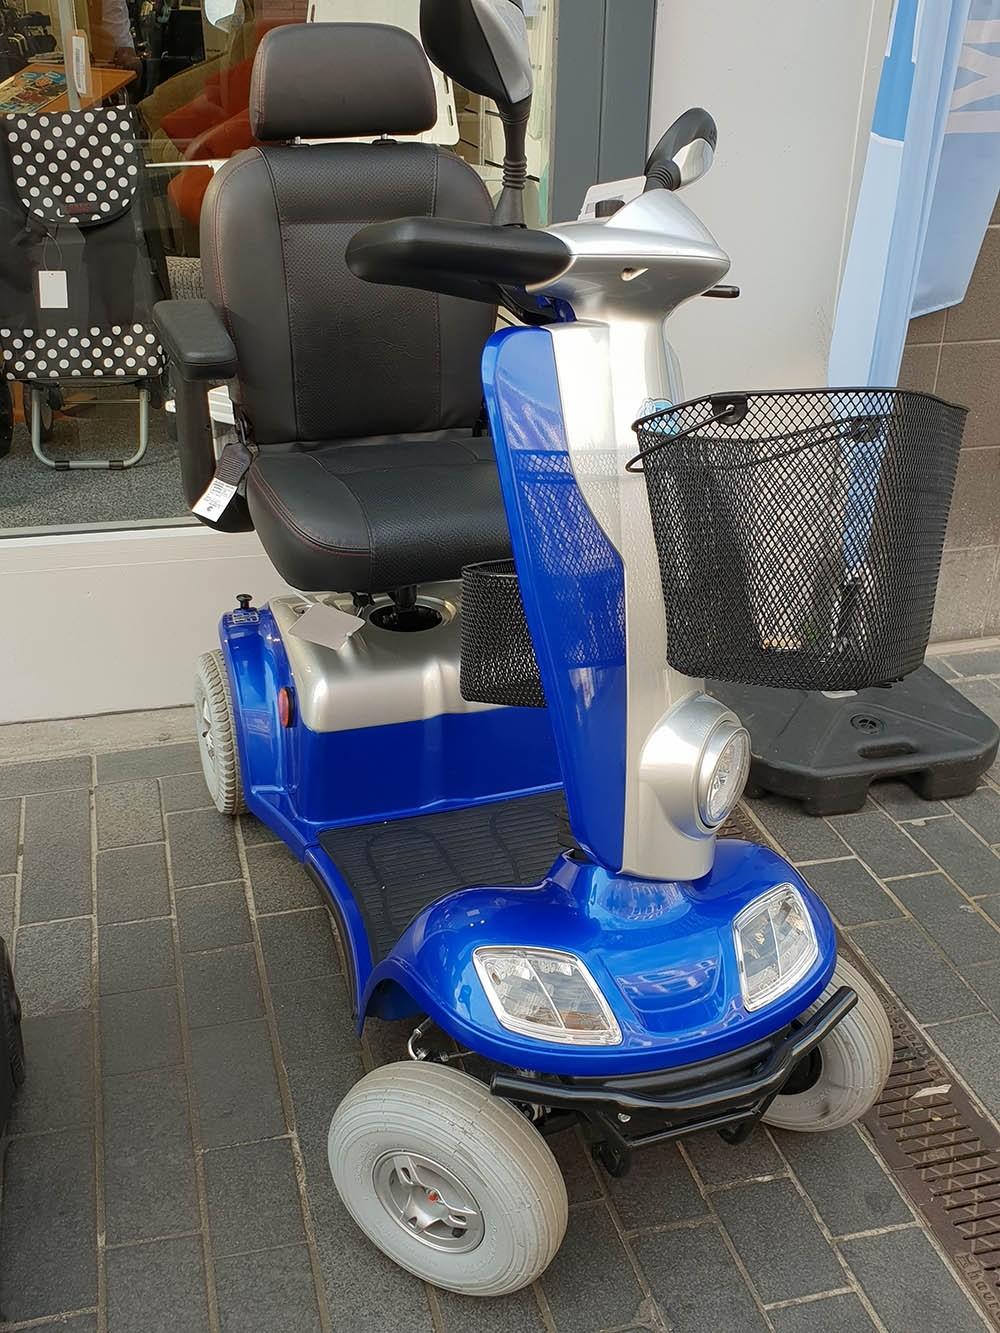 Kymco Mini XLS Blue